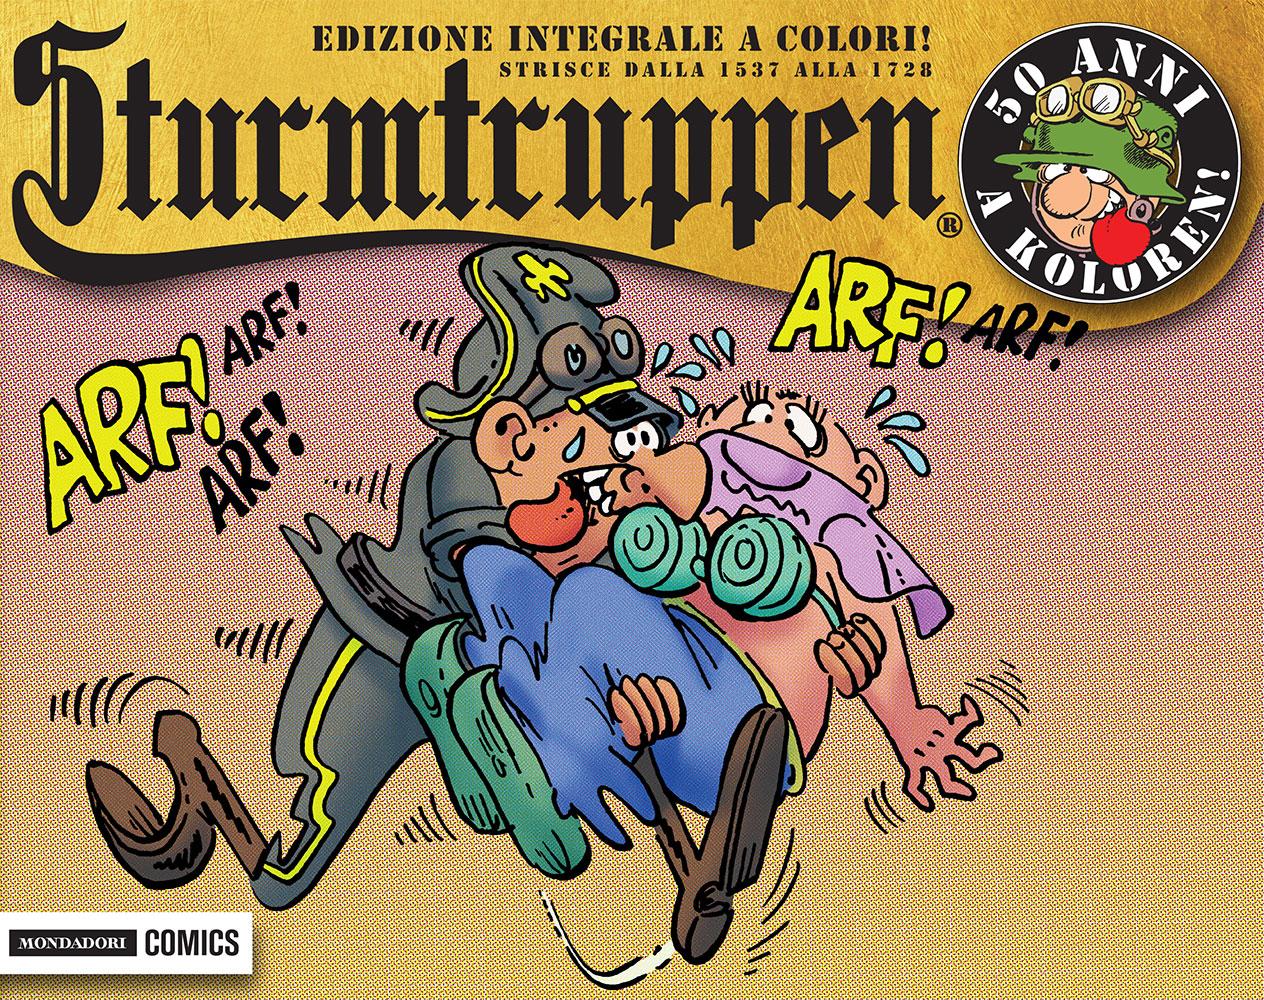 Sturmtruppen - 50 anni a koloren! vol. 9